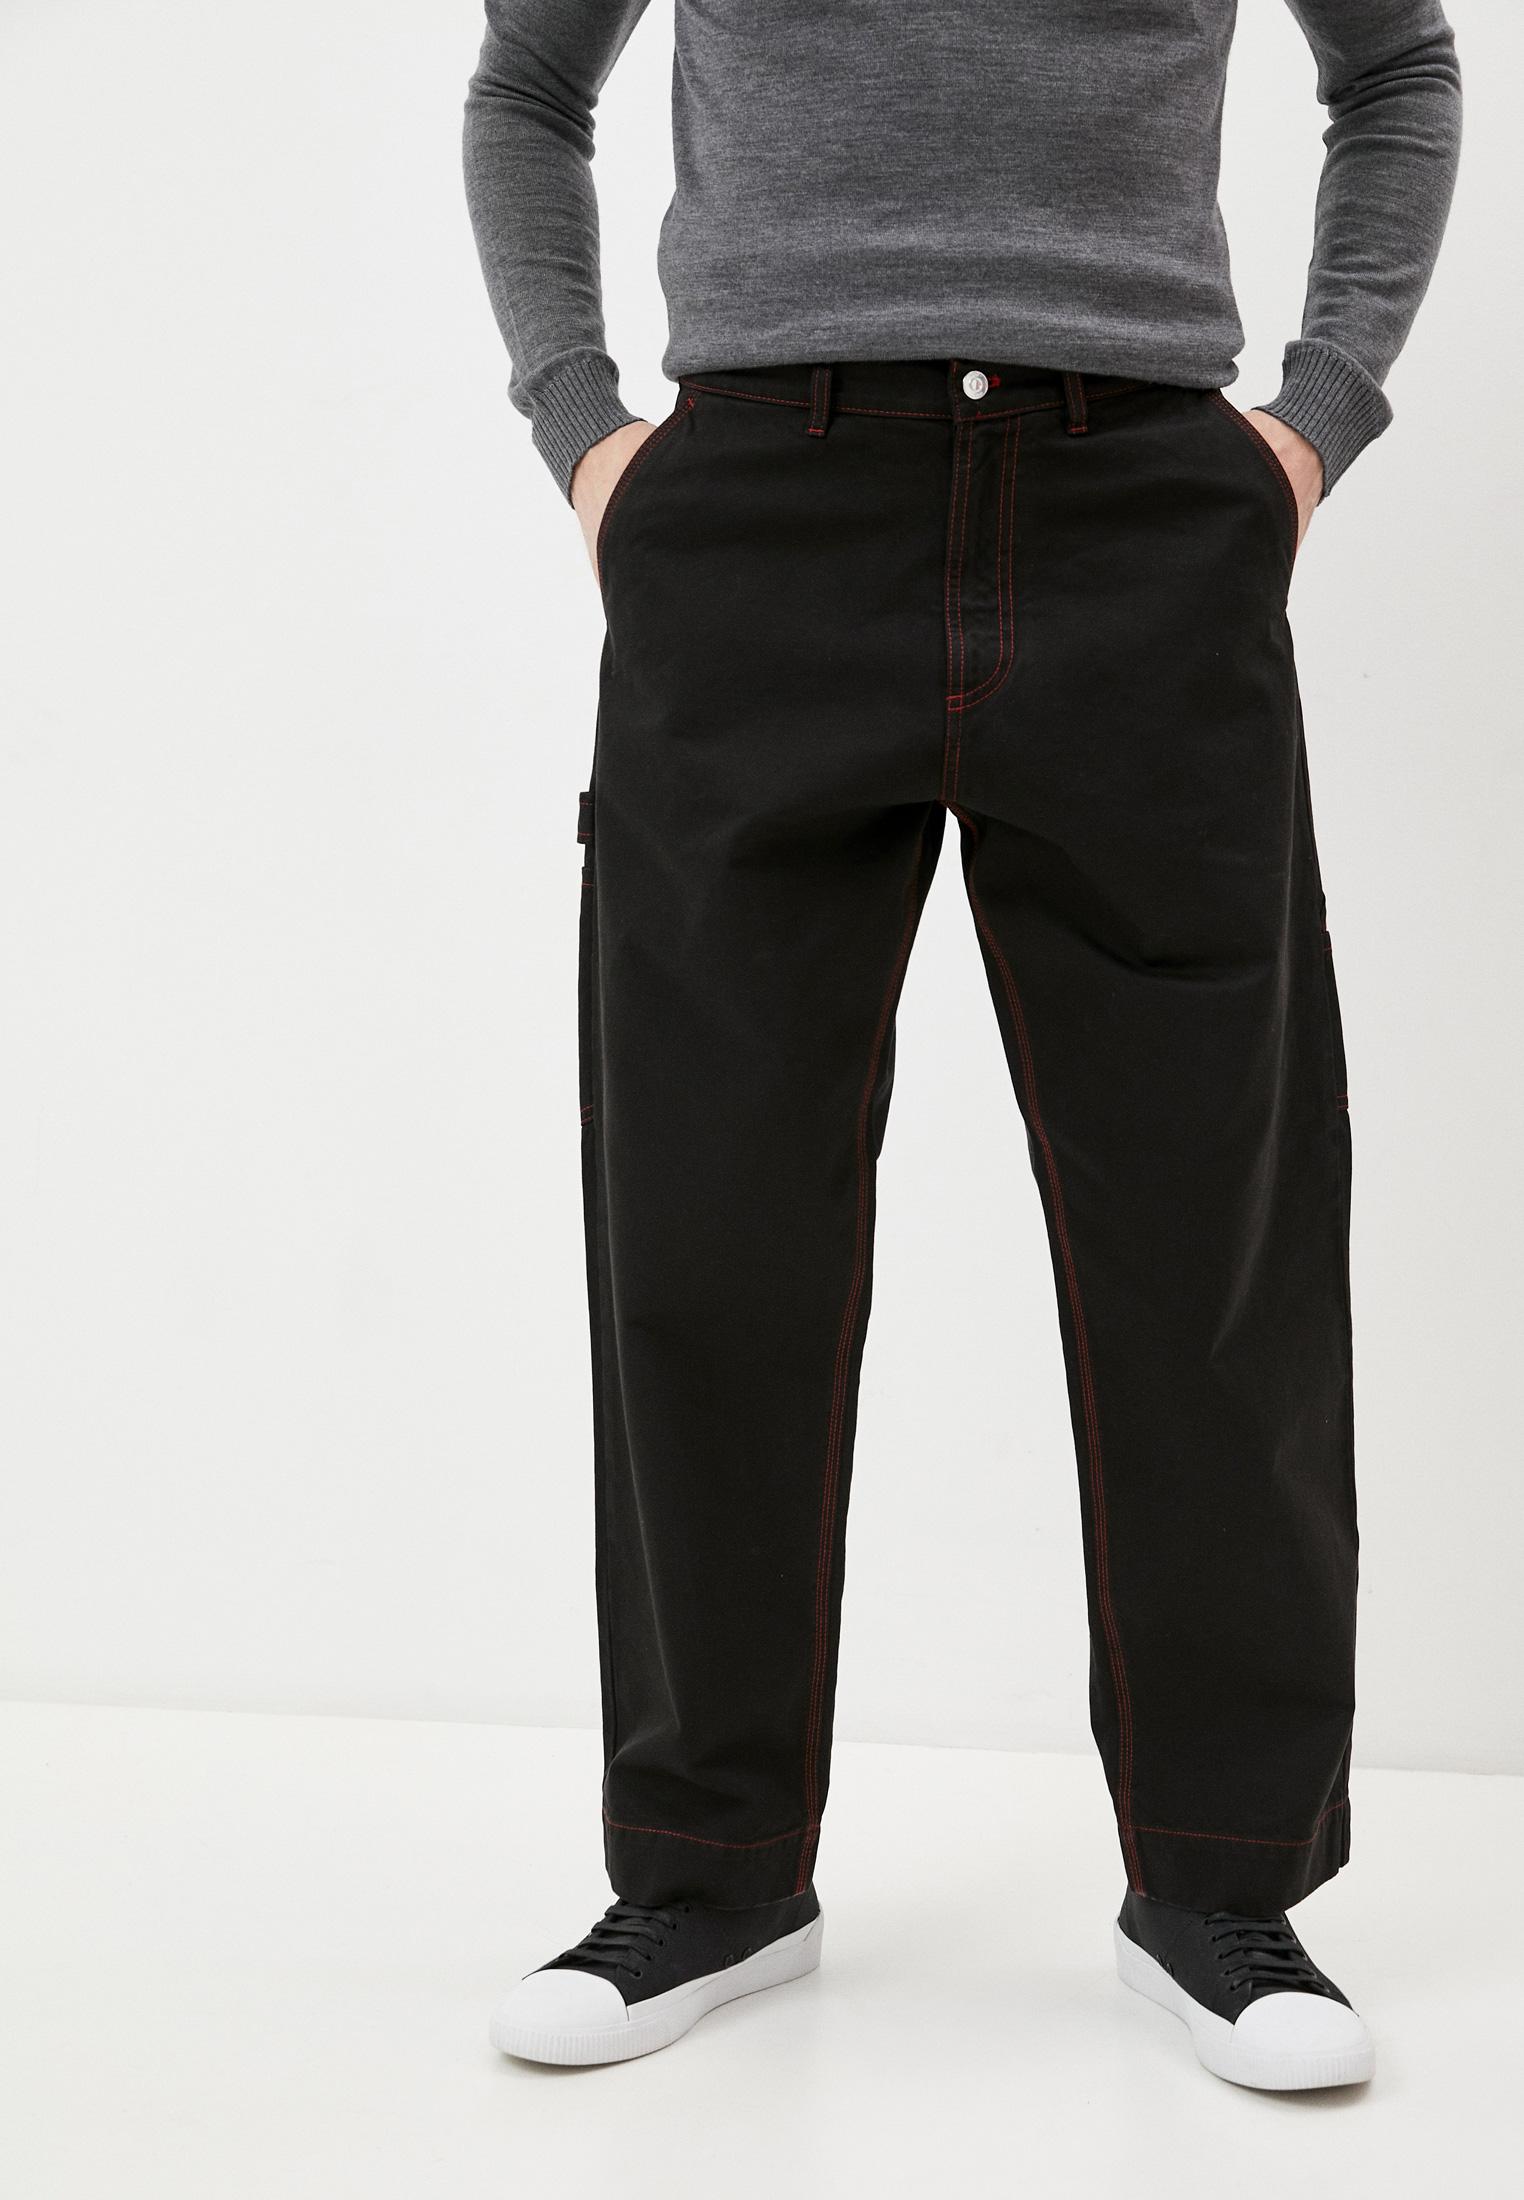 Мужские прямые джинсы N21 Джинсы N21